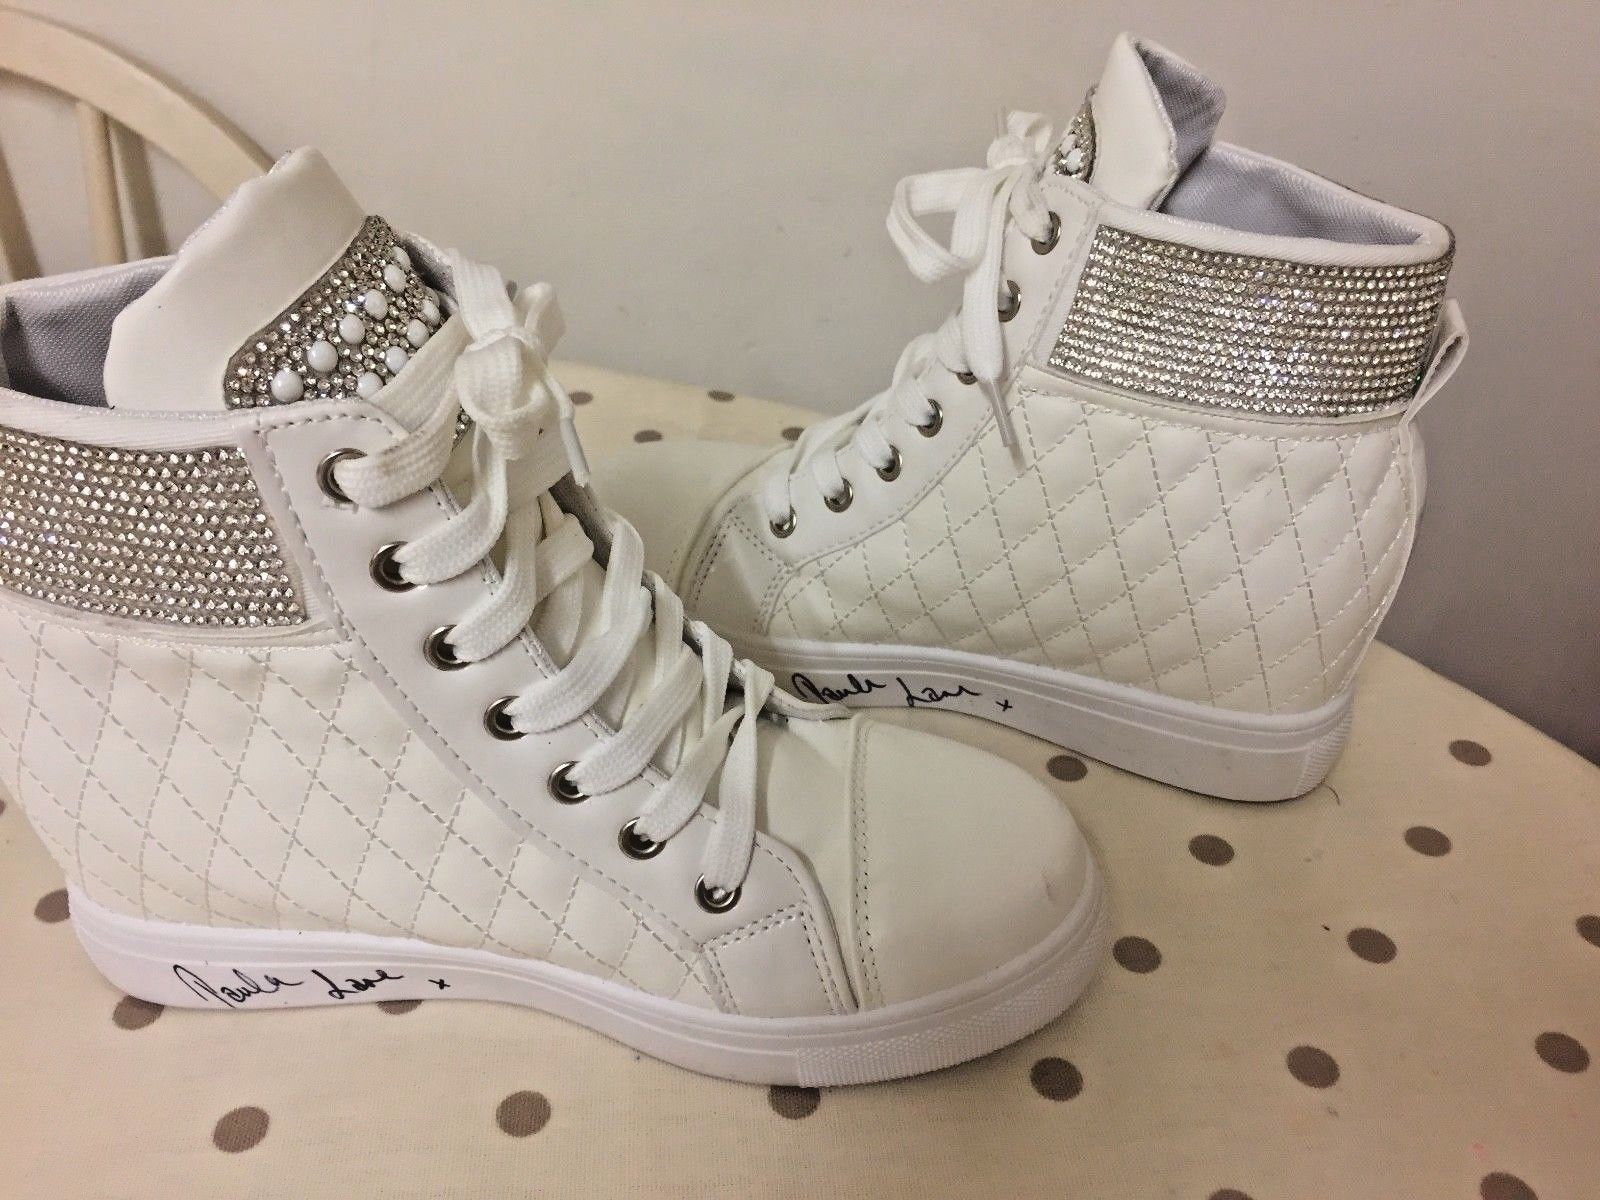 RT @team_lottie_: **eBay** Coronation Street Kylie Actress Paula Lanes Shoes, Worn on Set! https://t.co/QBfO3Dv5wk https://t.co/u8dMTrNZuP